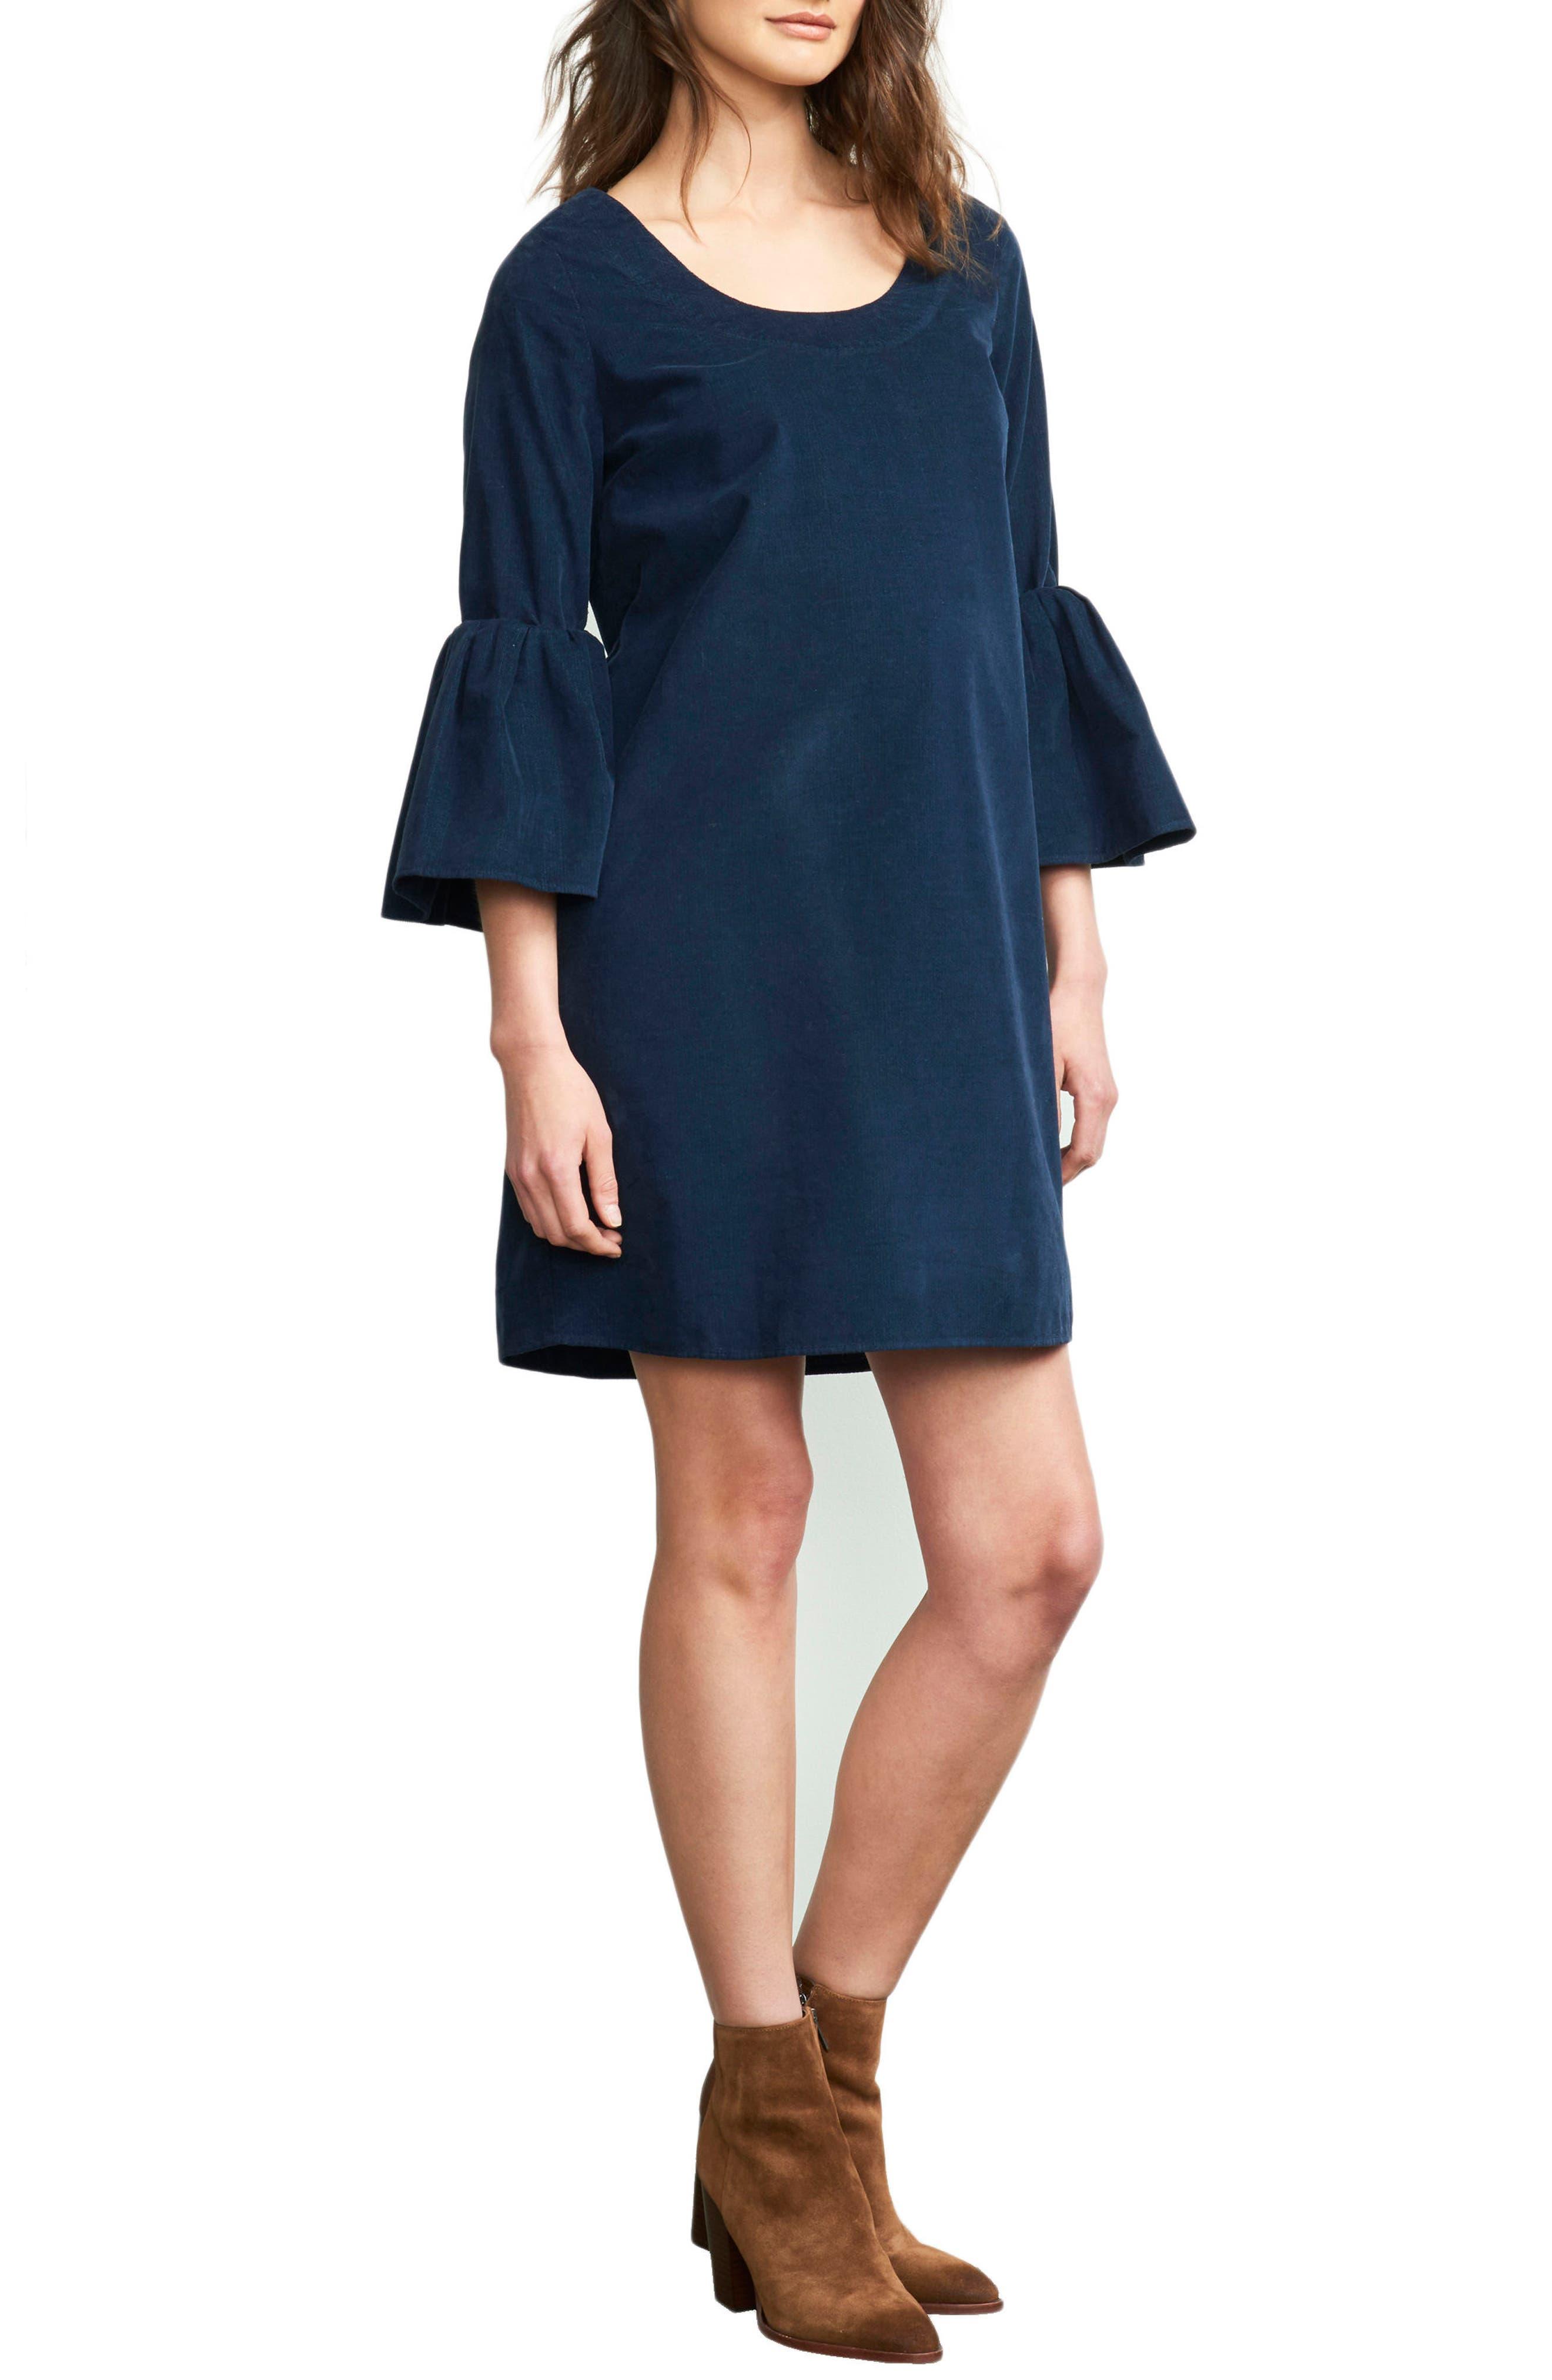 Maternal America Bell Sleeve Maternity Dress